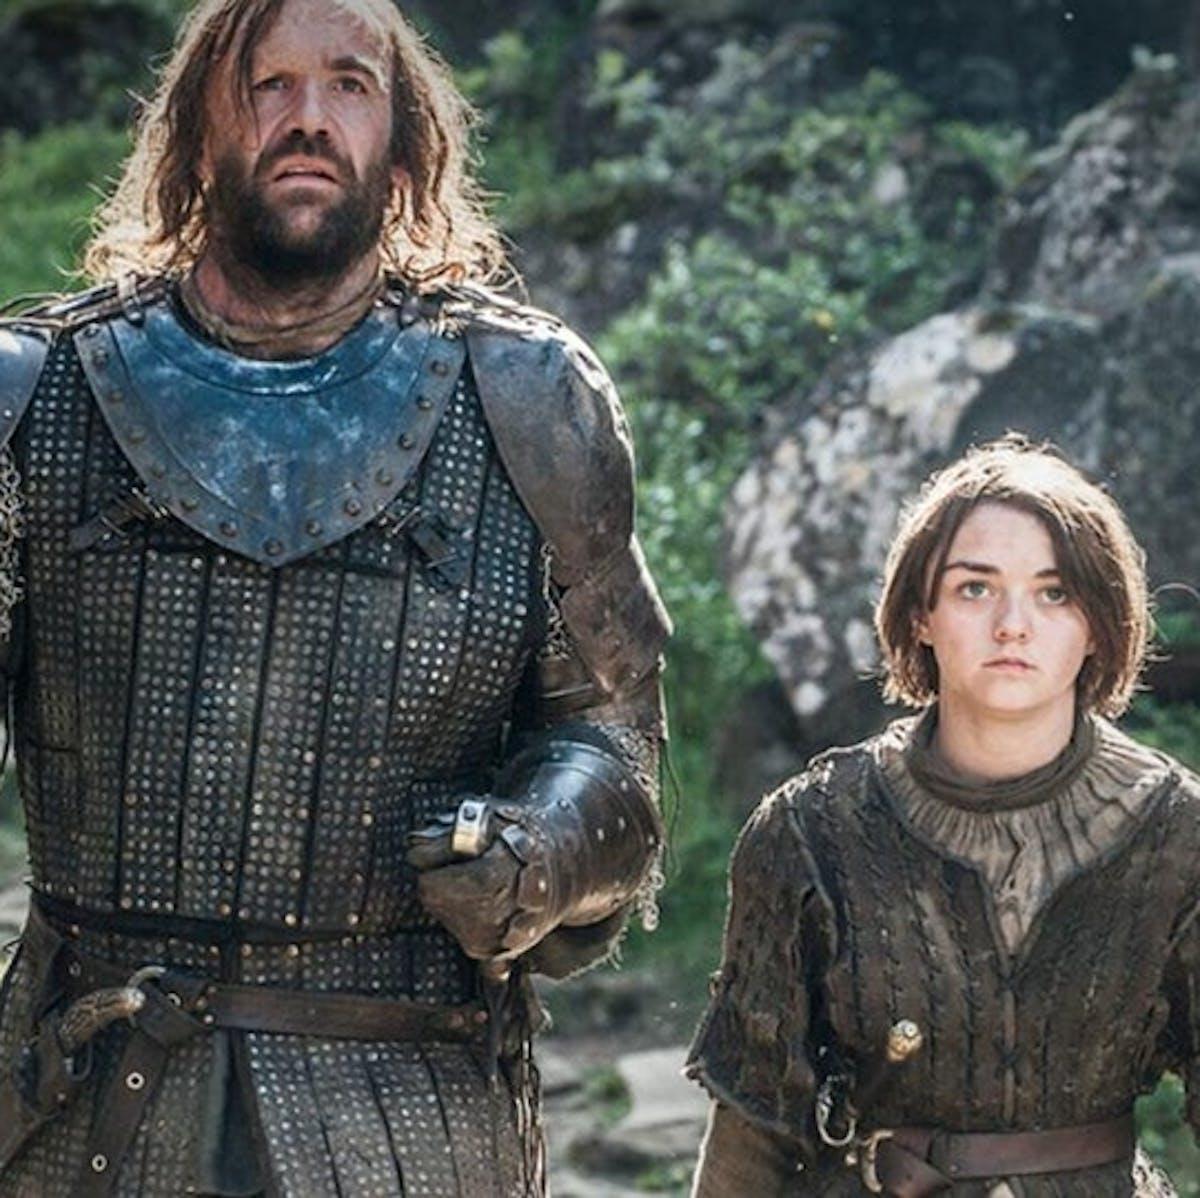 Game of Thrones' Season 8 Spoilers: Promos Tease a Major